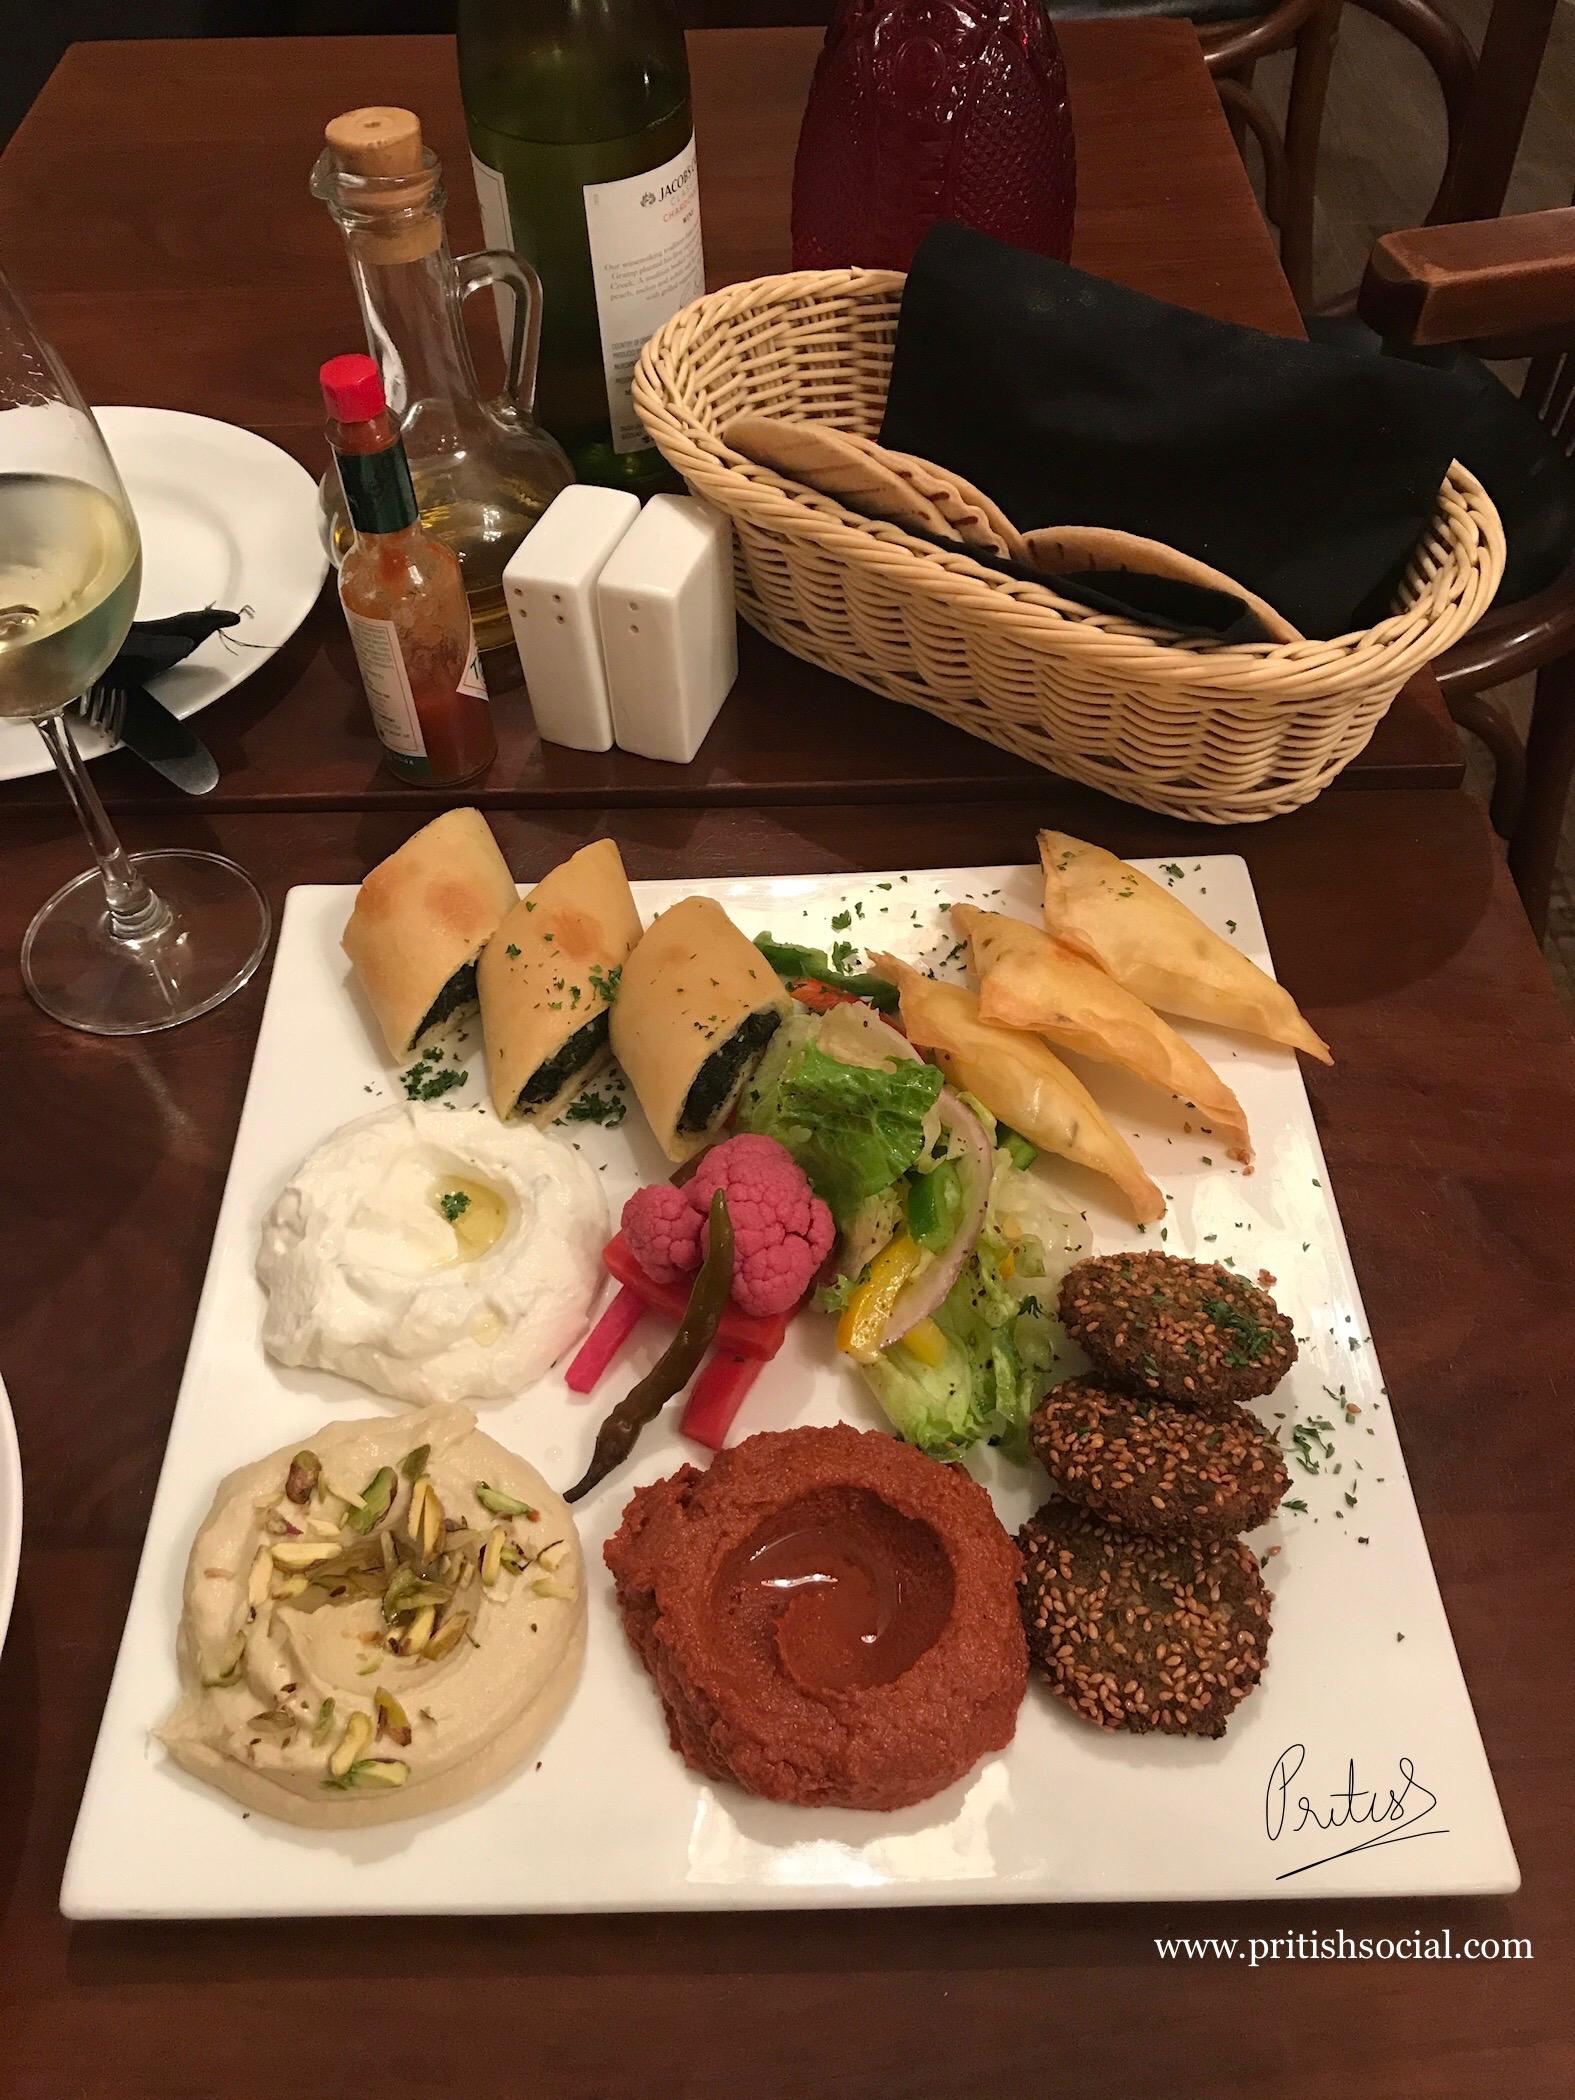 Café Nomad Chandigarh | Best Middle Eastern Restaurant | Mezze Platter | Food Blog | PritishSocial